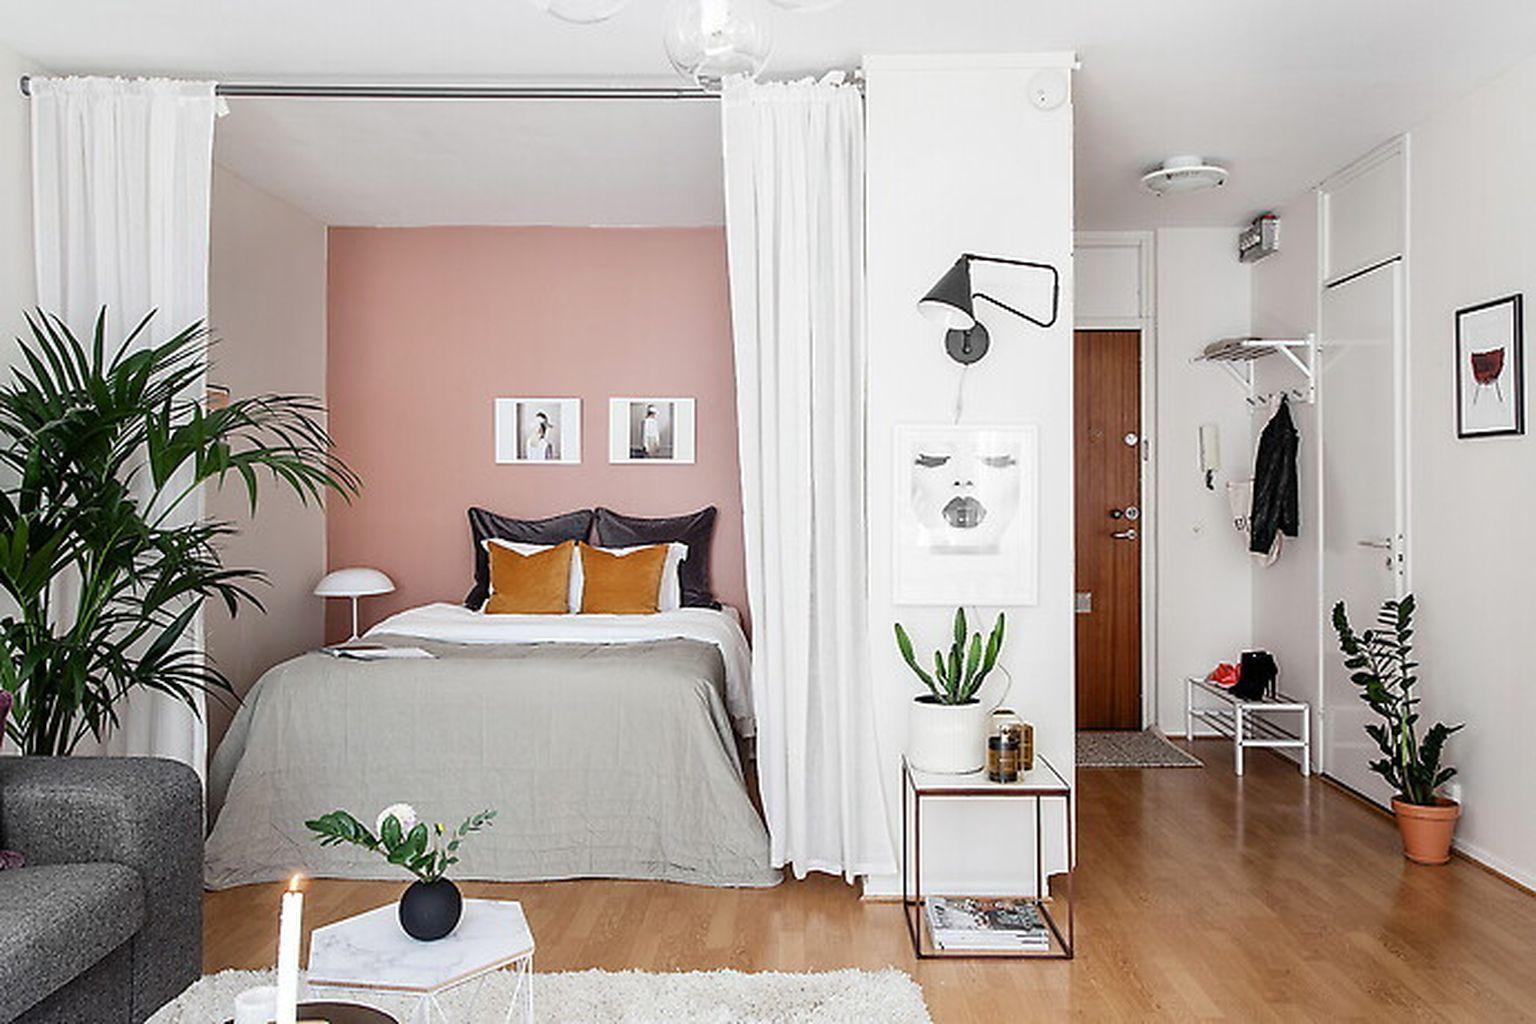 52 outstanding art studio apartment design ideas - Art Studio Design Ideas